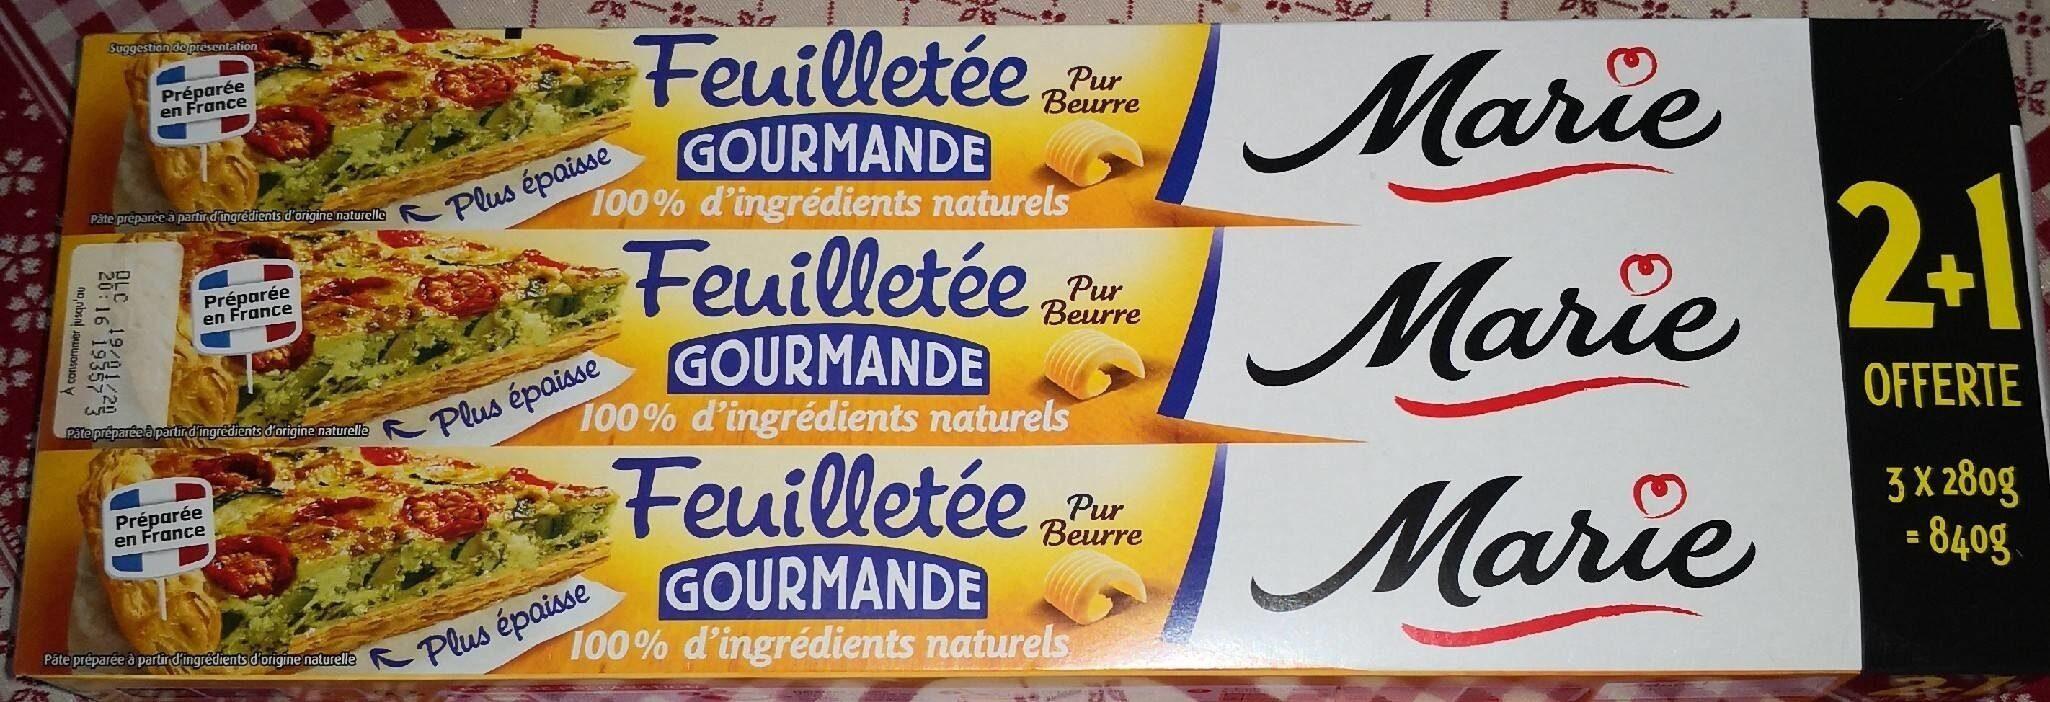 Feuilletée Gourmande - Product